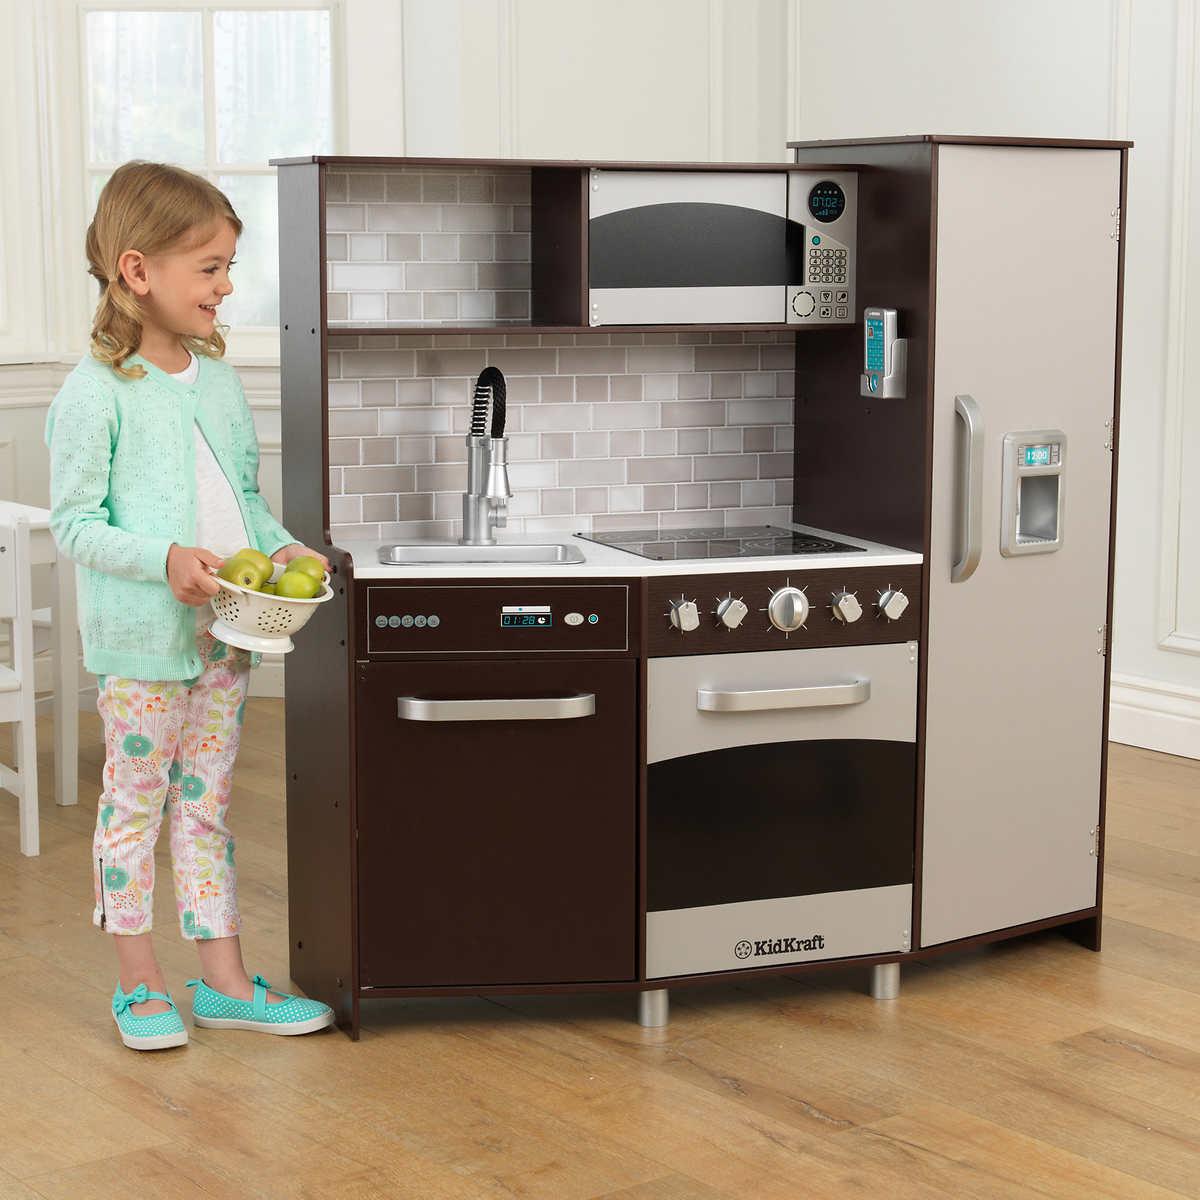 Kidkraft Large Play Kitchen Espresso Smart Sturdy Wood Construction Ebay